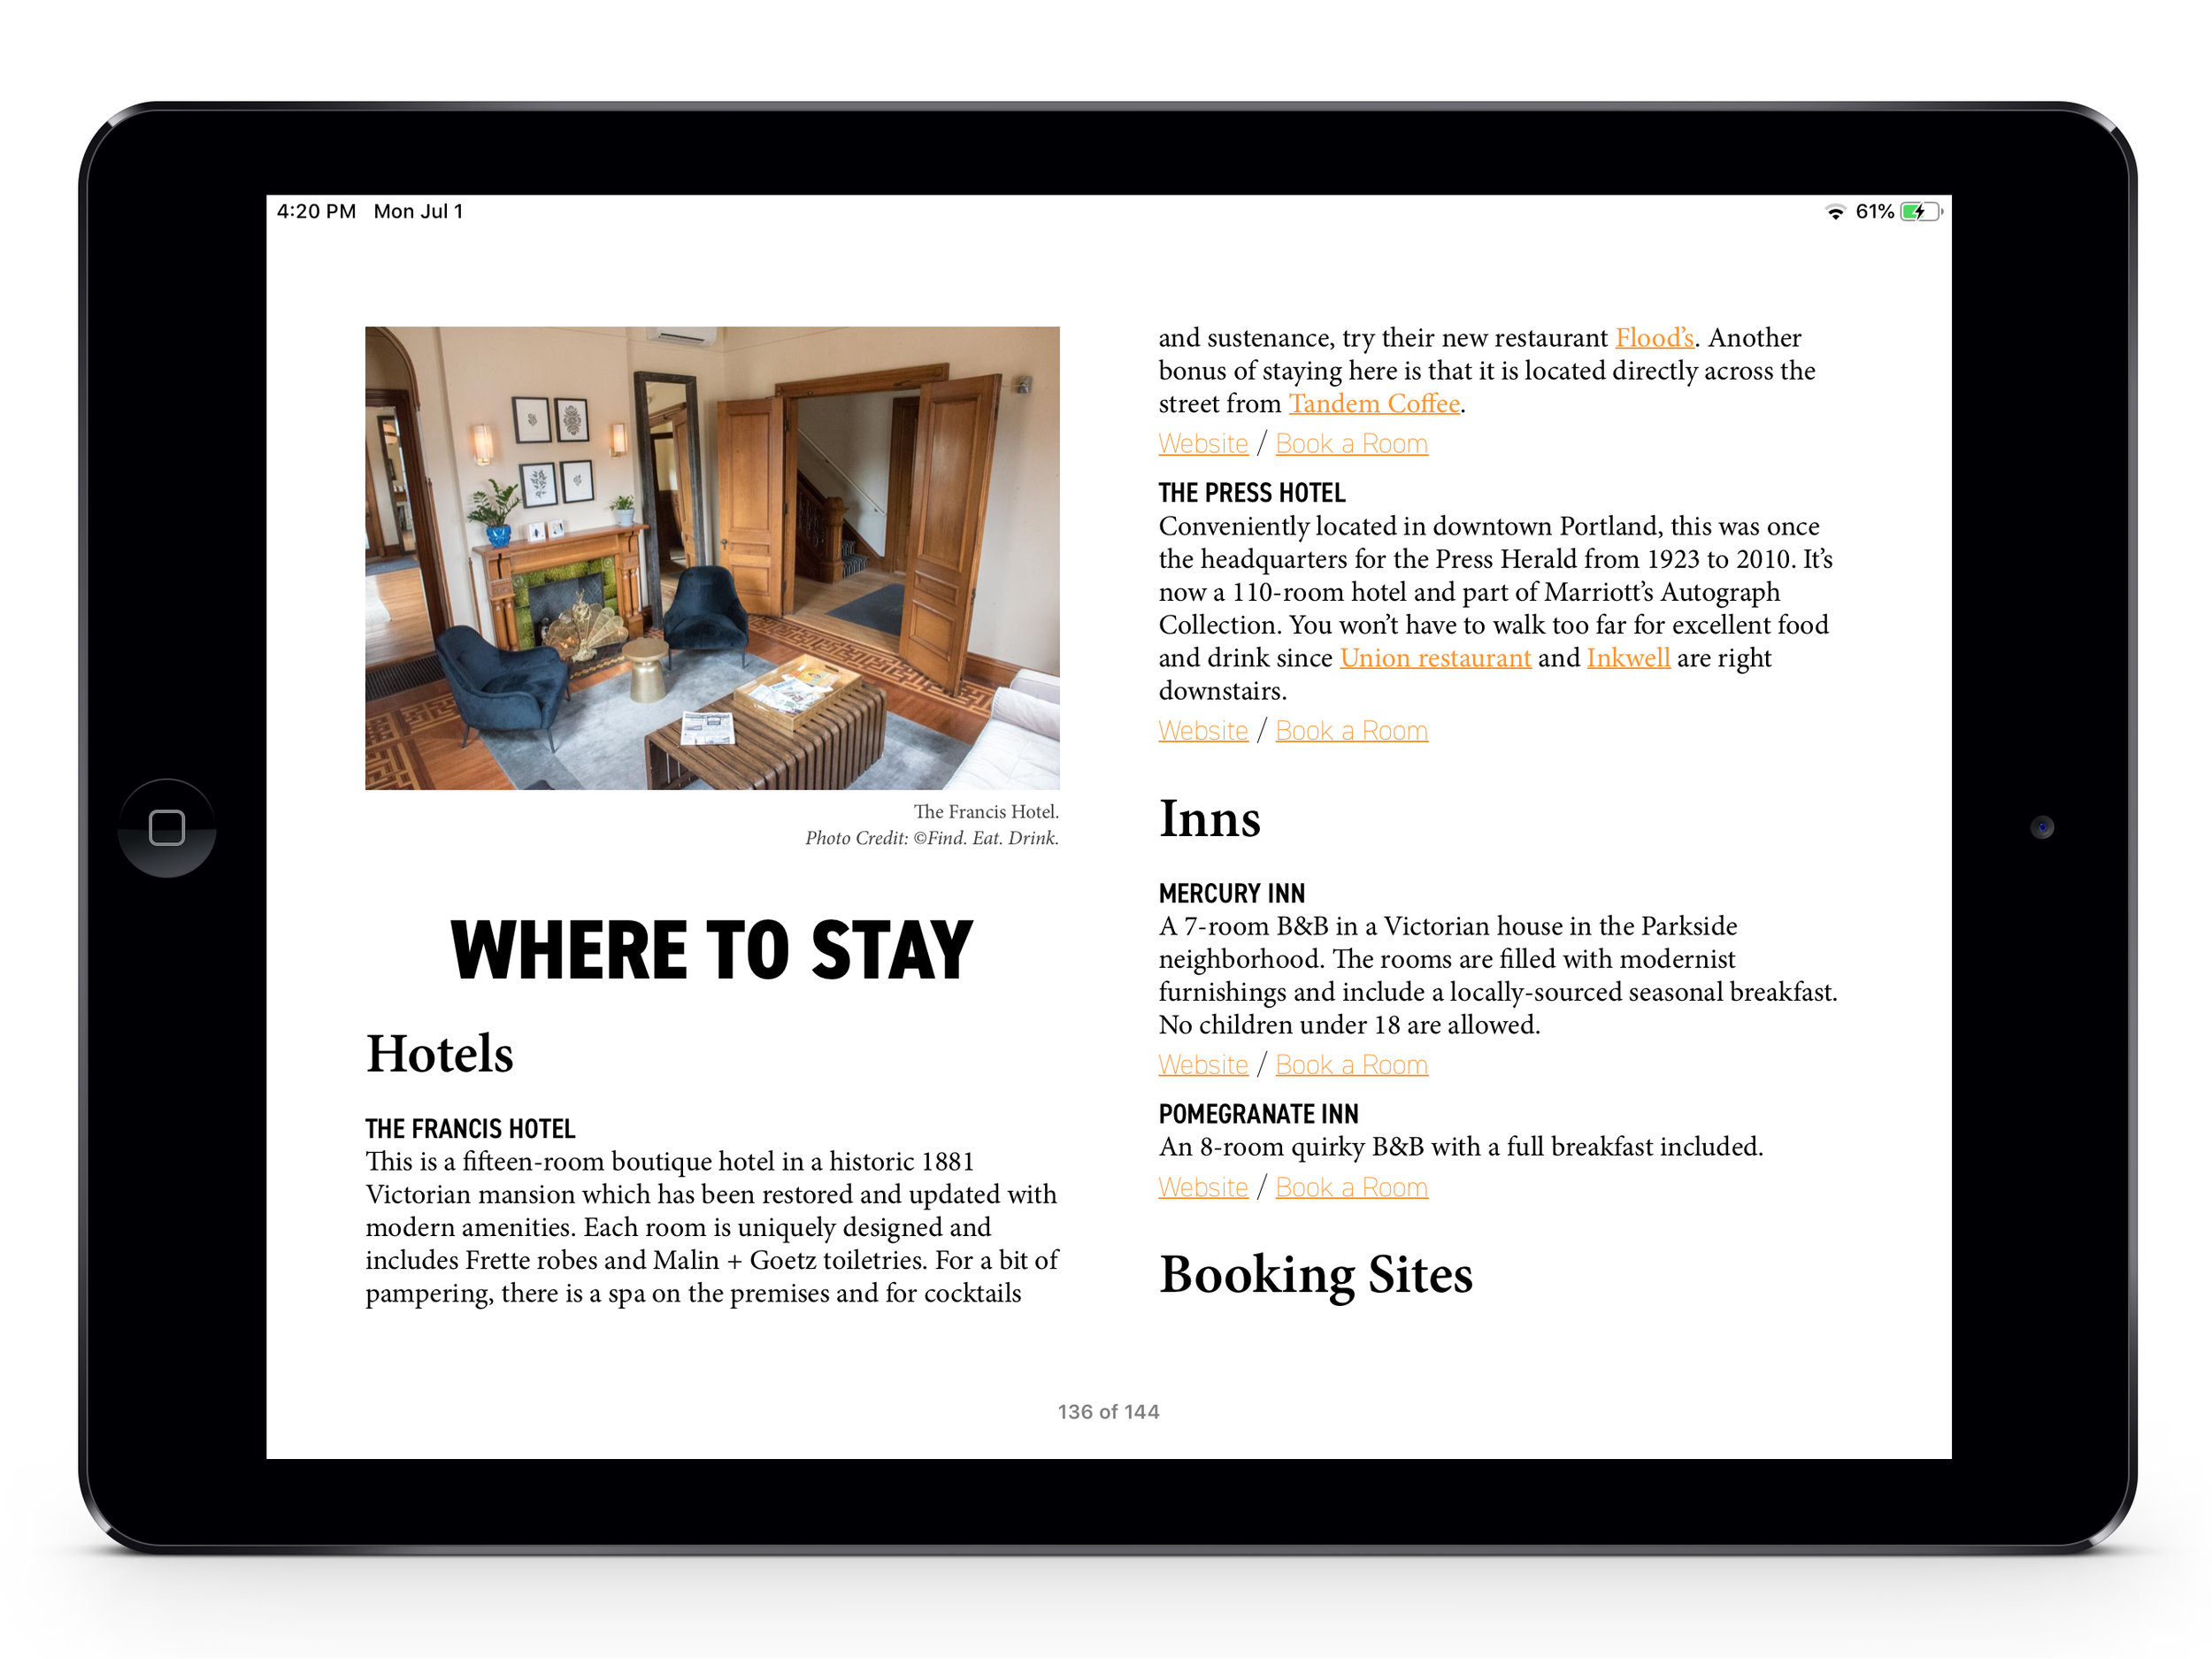 iPadAir_PortlandME_Screenshots_Landscape_1.22.jpg